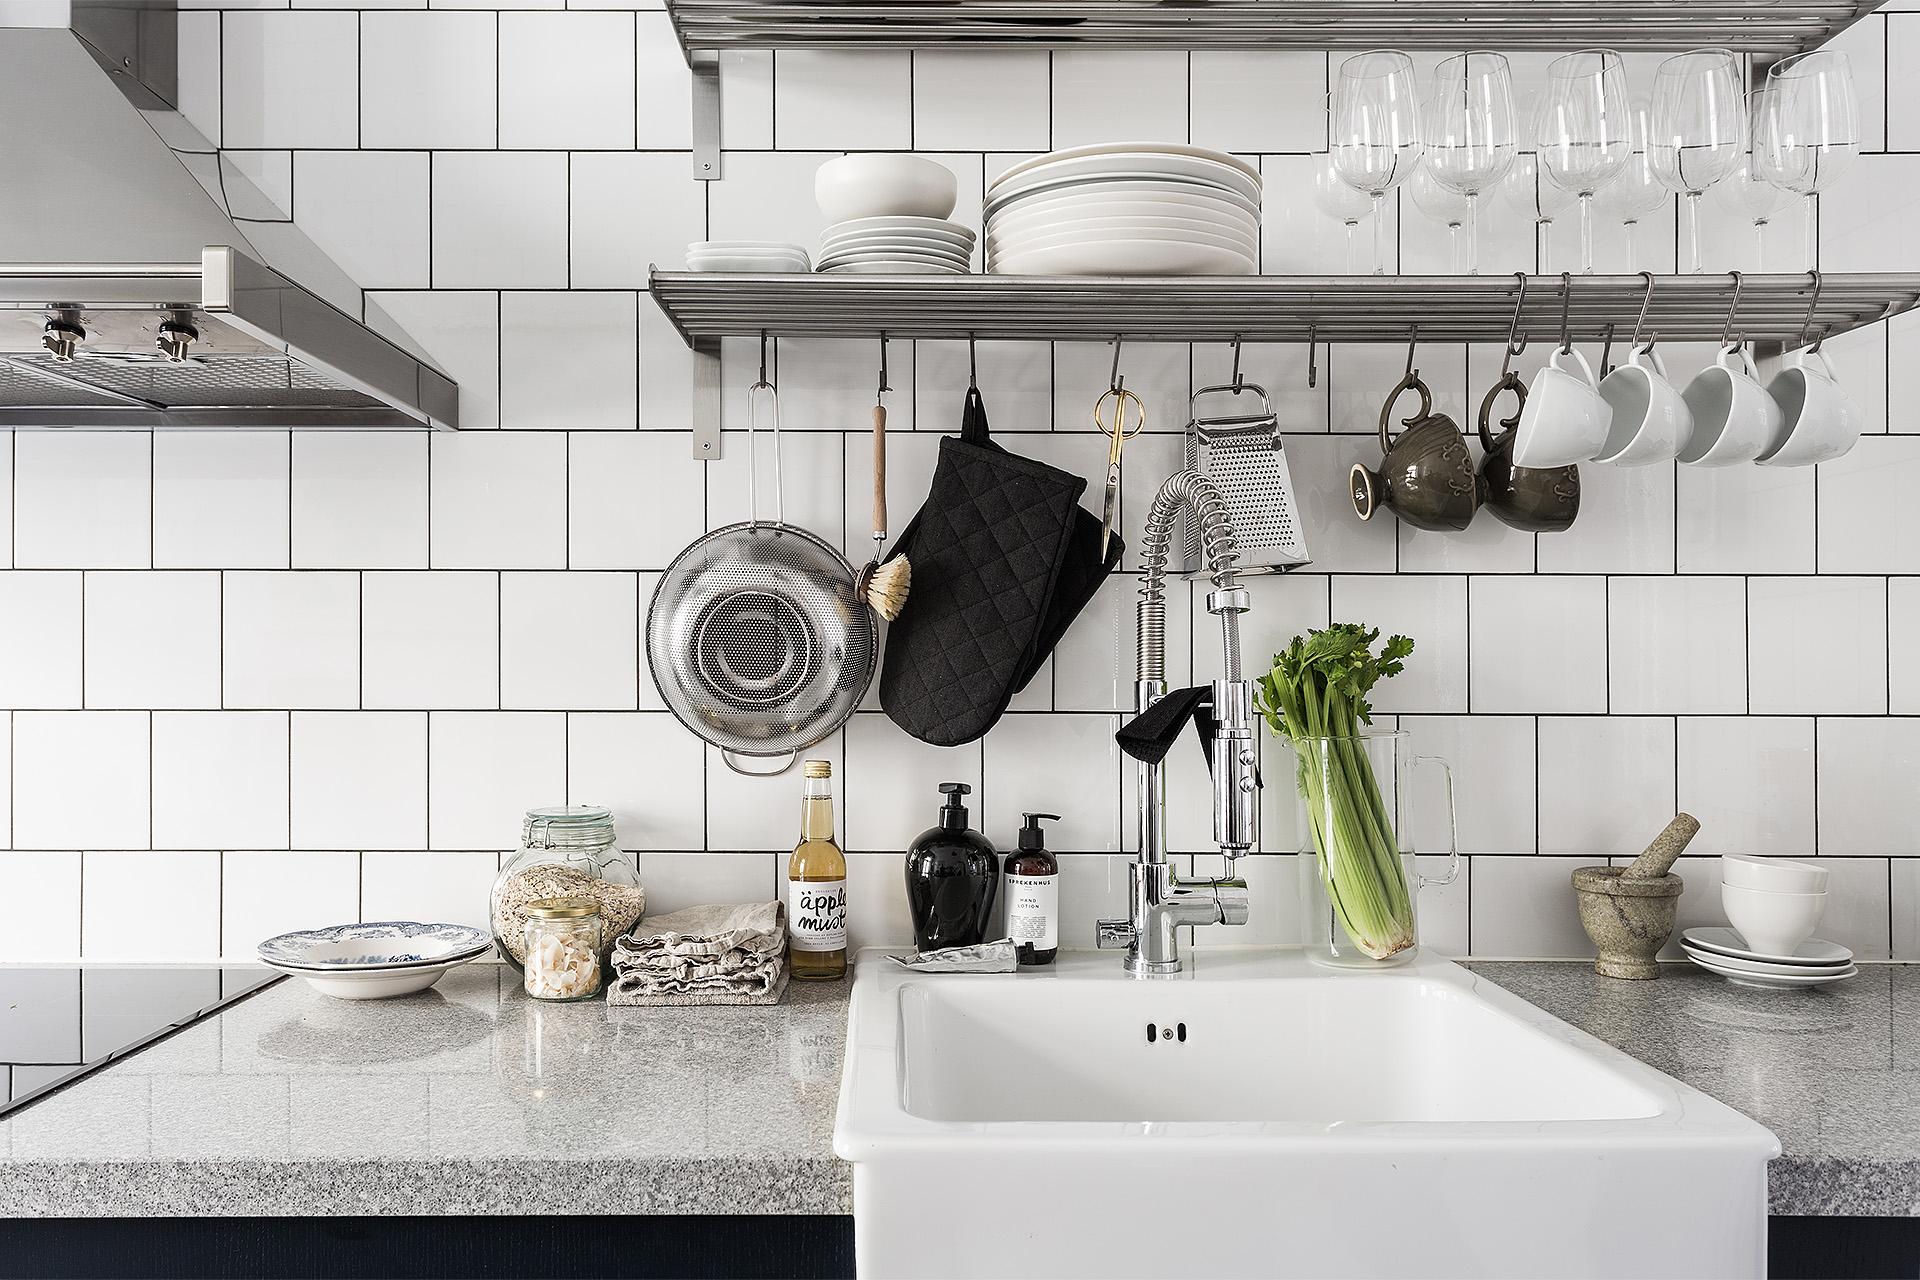 Blauwe Keuken Met Witte Wandtegels Homease